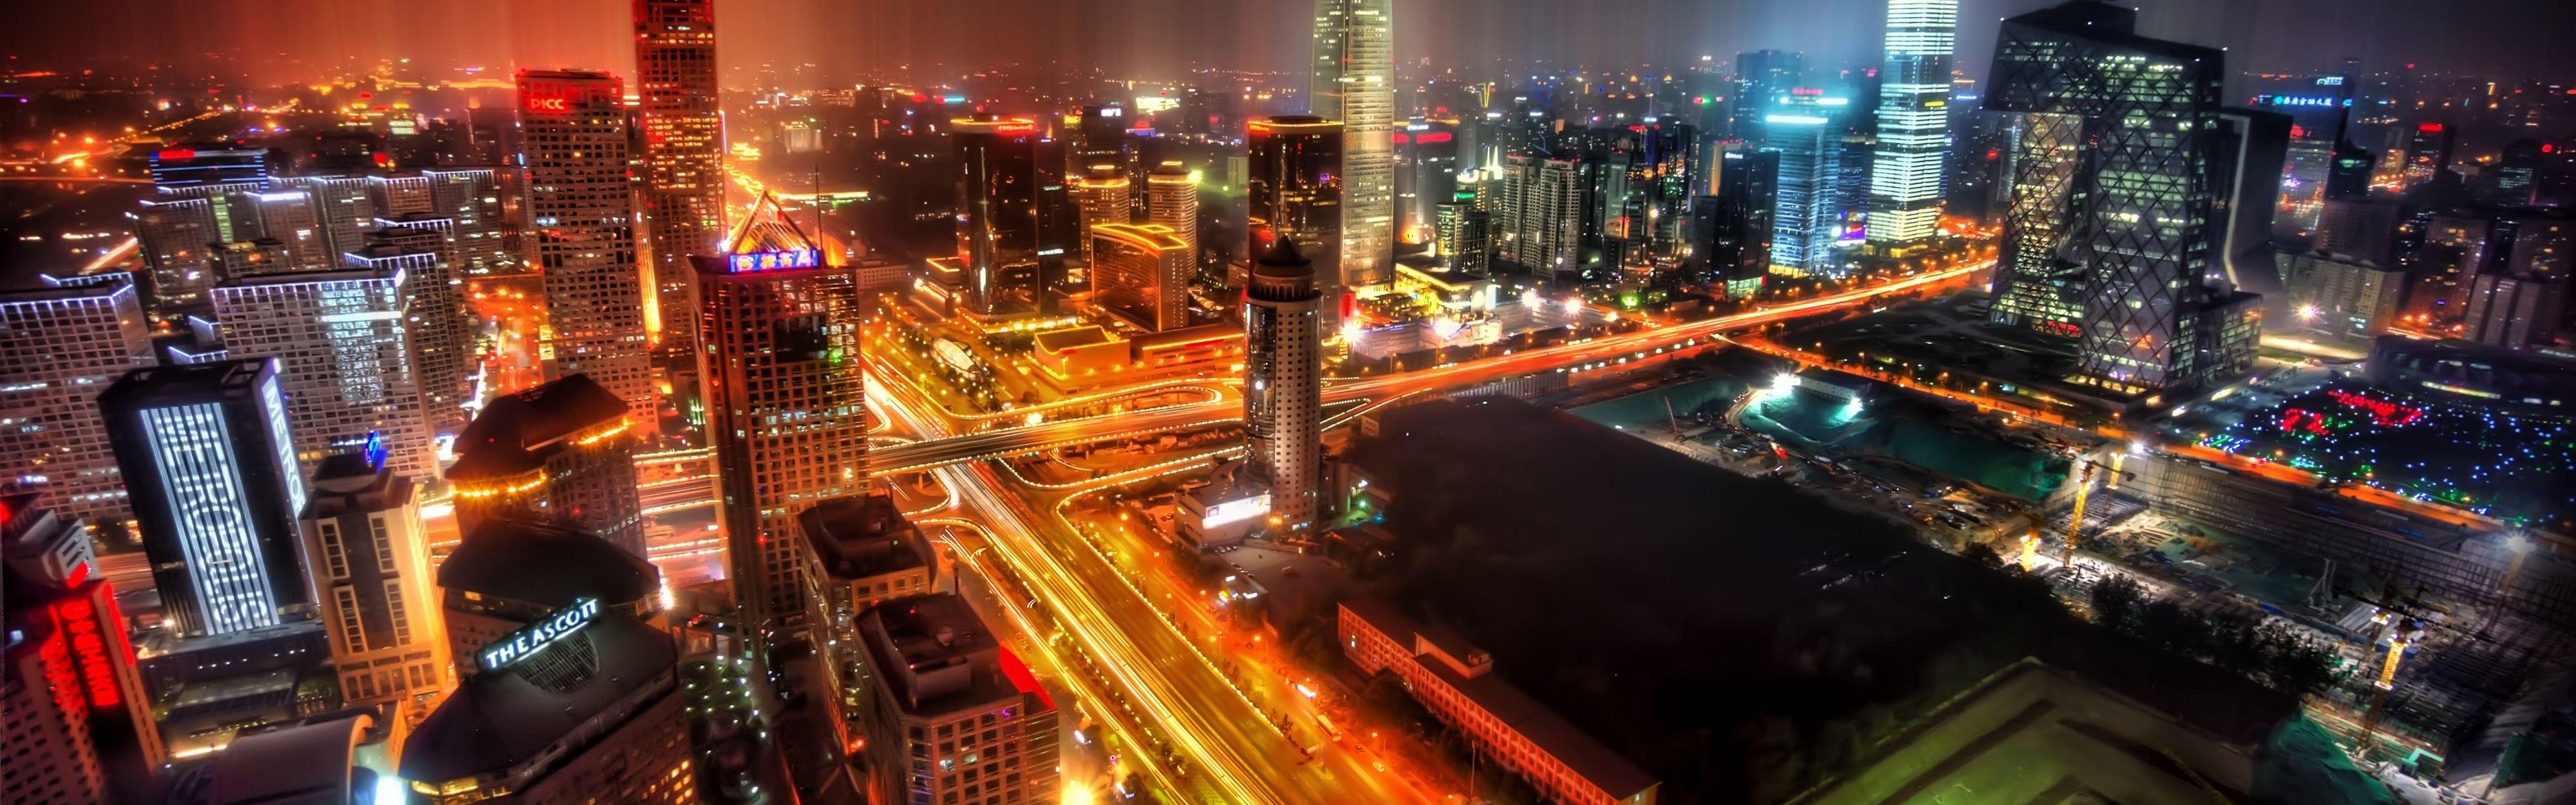 Best City Iphone Panoramic Wallpapers Hd Ilikewallpaper